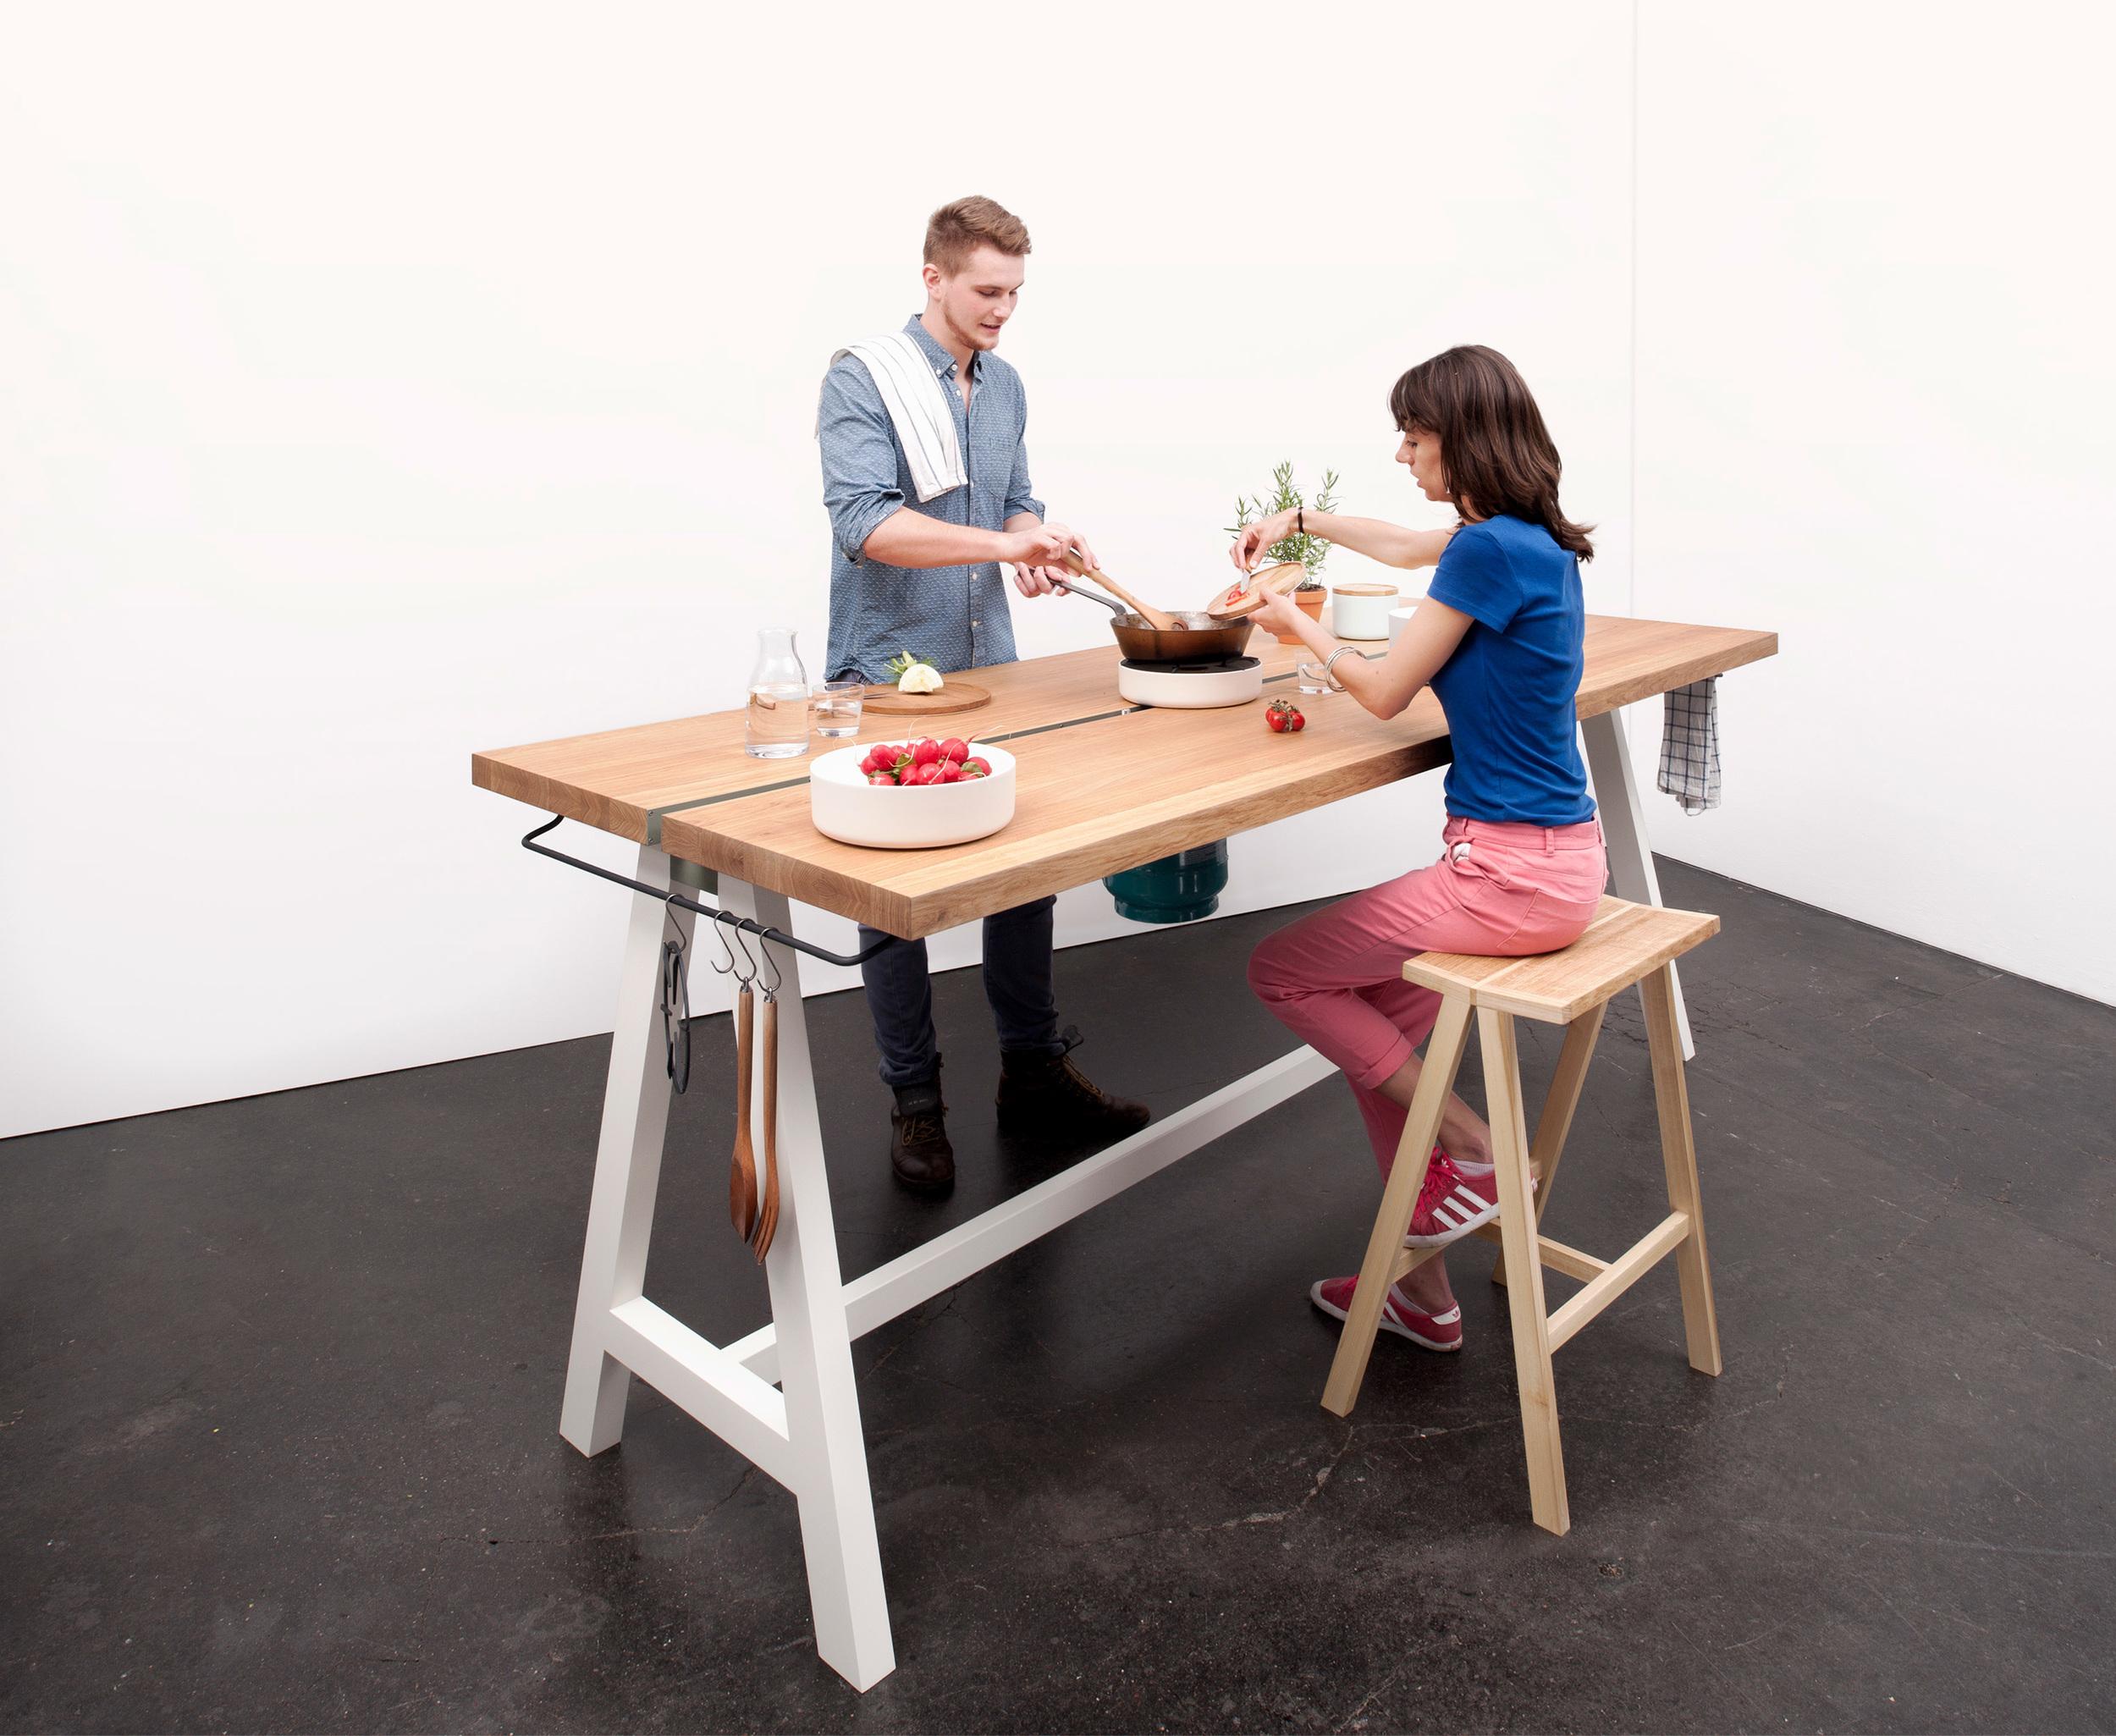 Studio-MoritzPutzier_The-Cooking-Table-01.jpg